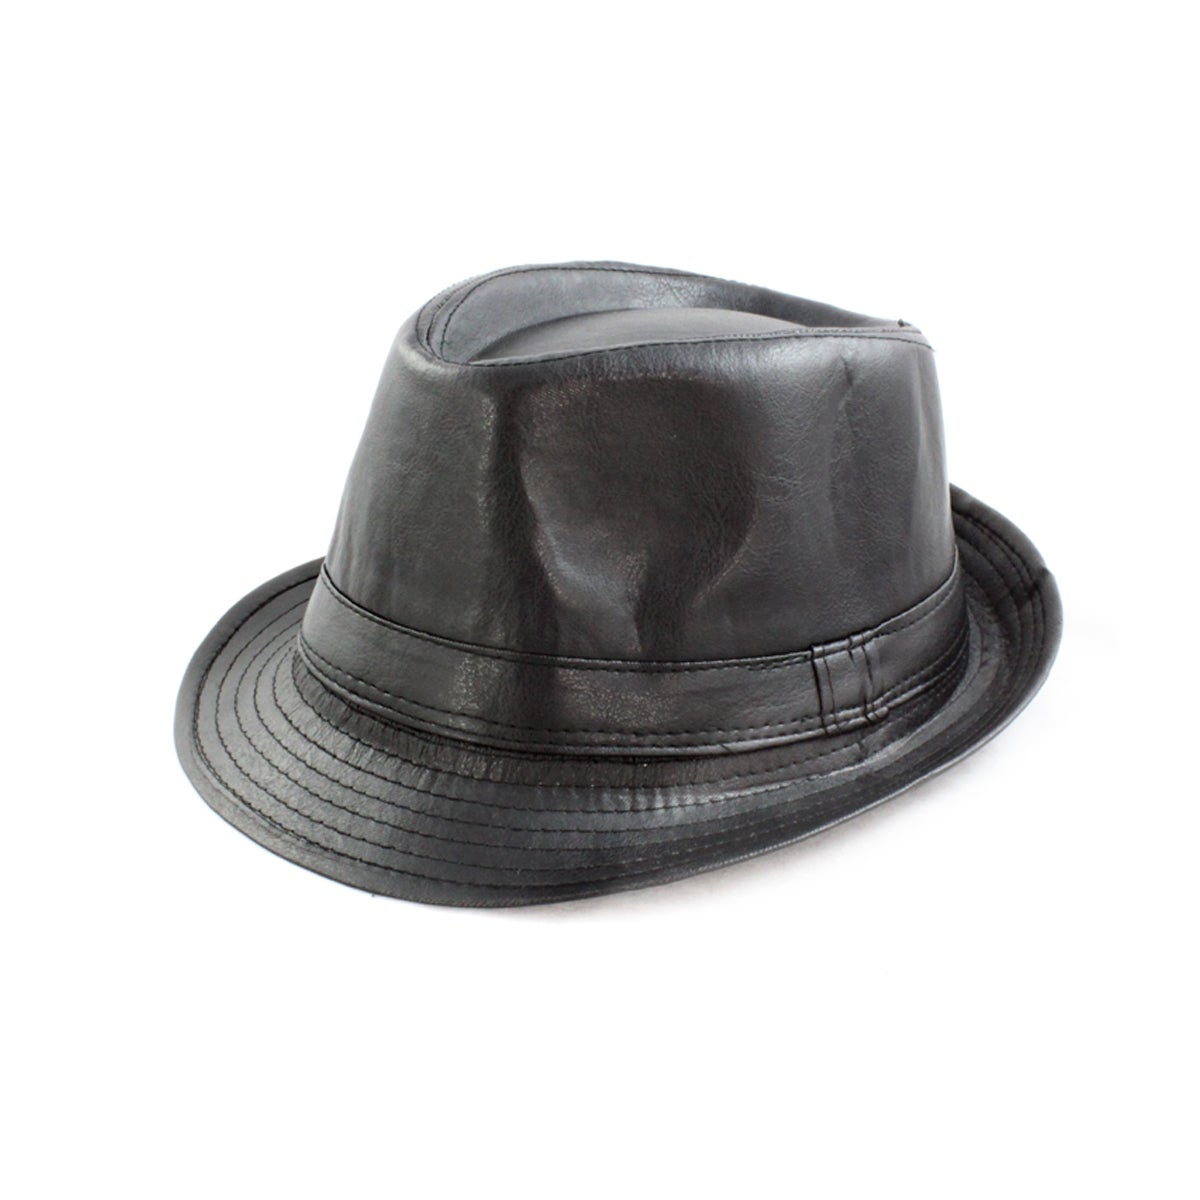 Faddism Men's Black Faux-leather Fedora Hat